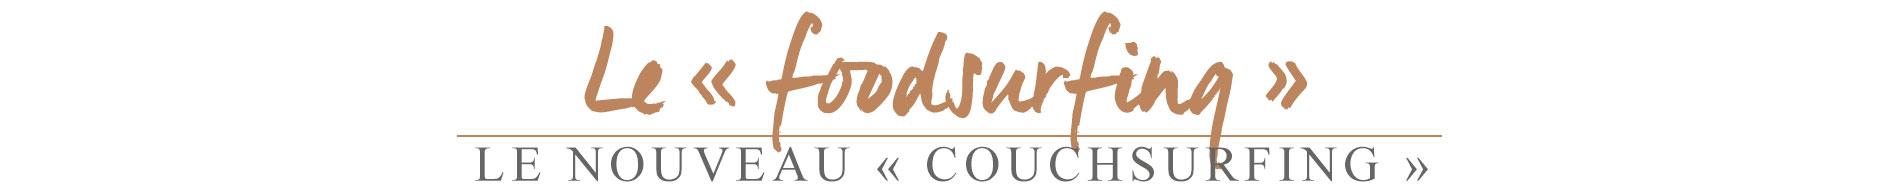 foodsurfing, tendance foodsurfing